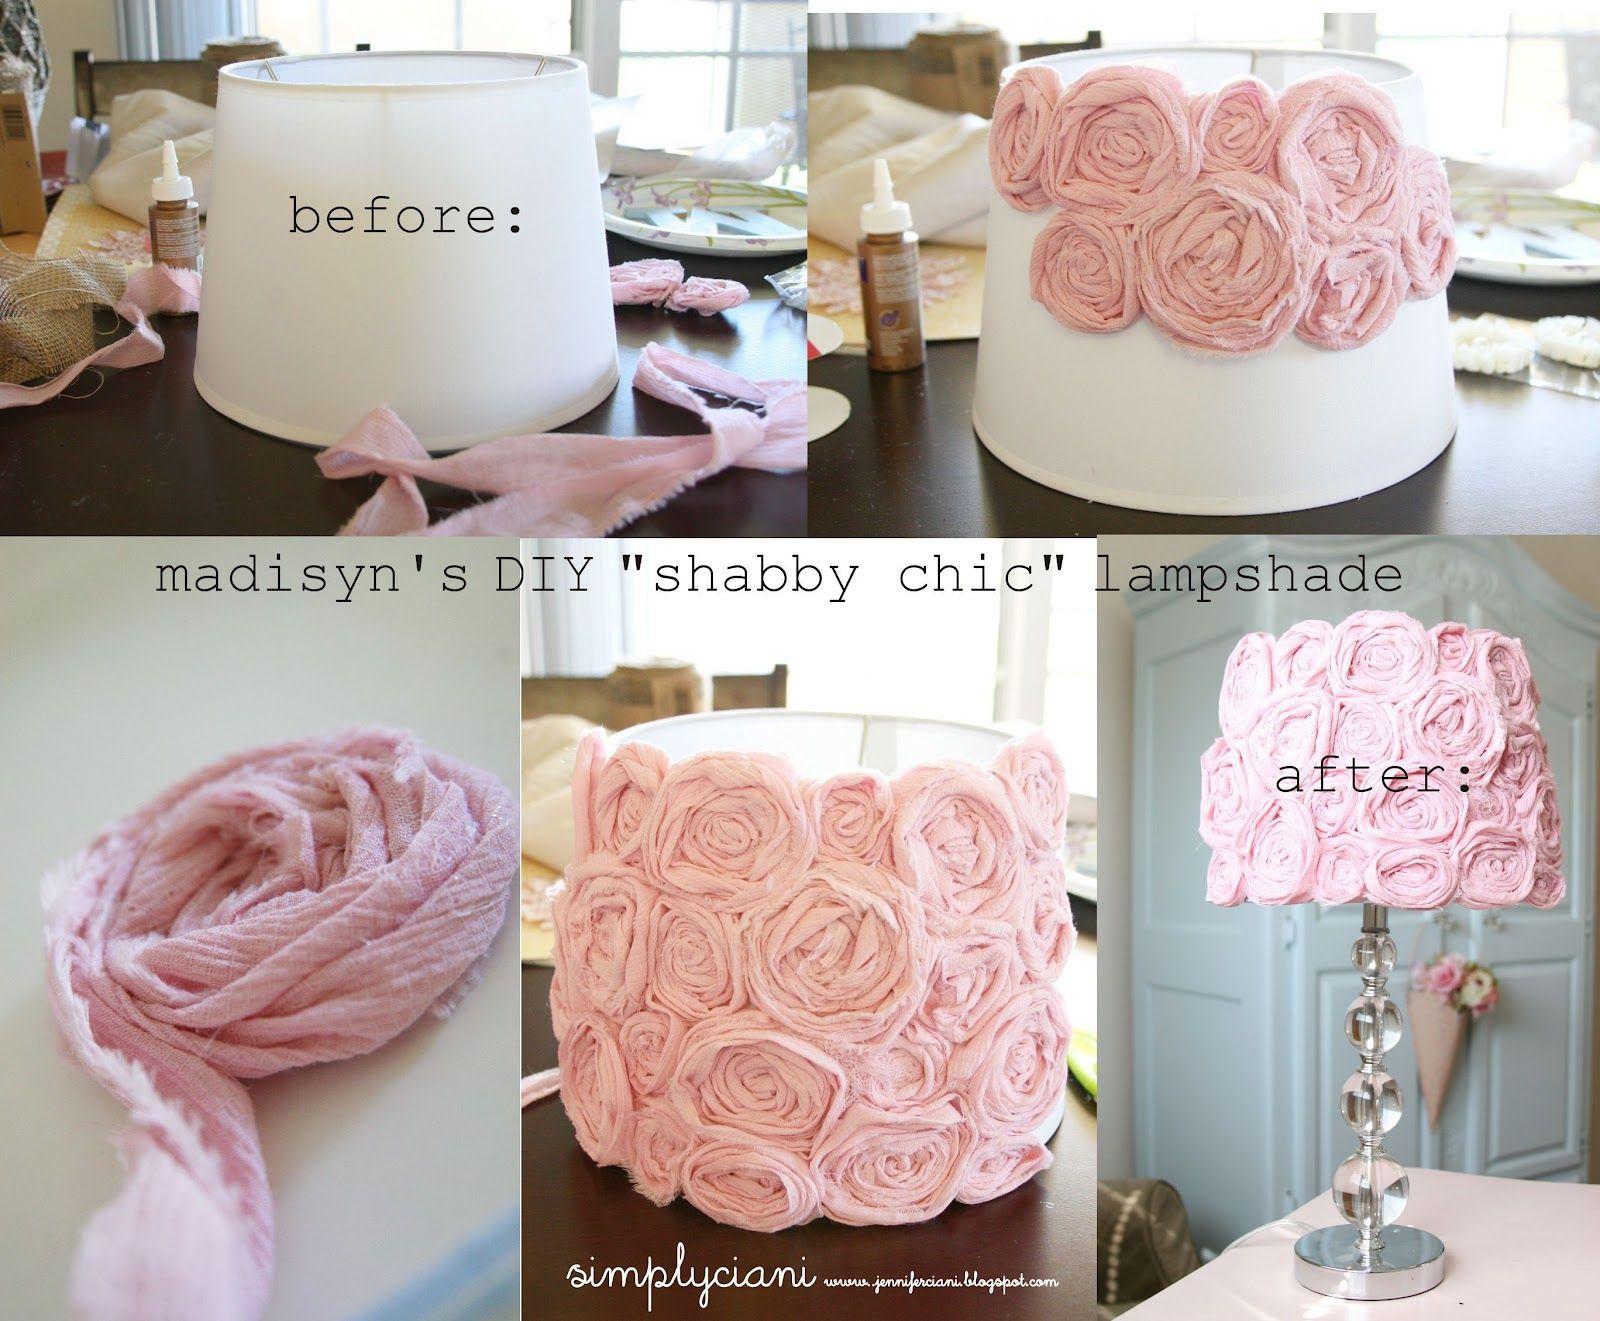 Diy lampshade rosesoh la la cute for a nursery craftsdiy diy lampshade rosesoh la la cute for a nursery mightylinksfo